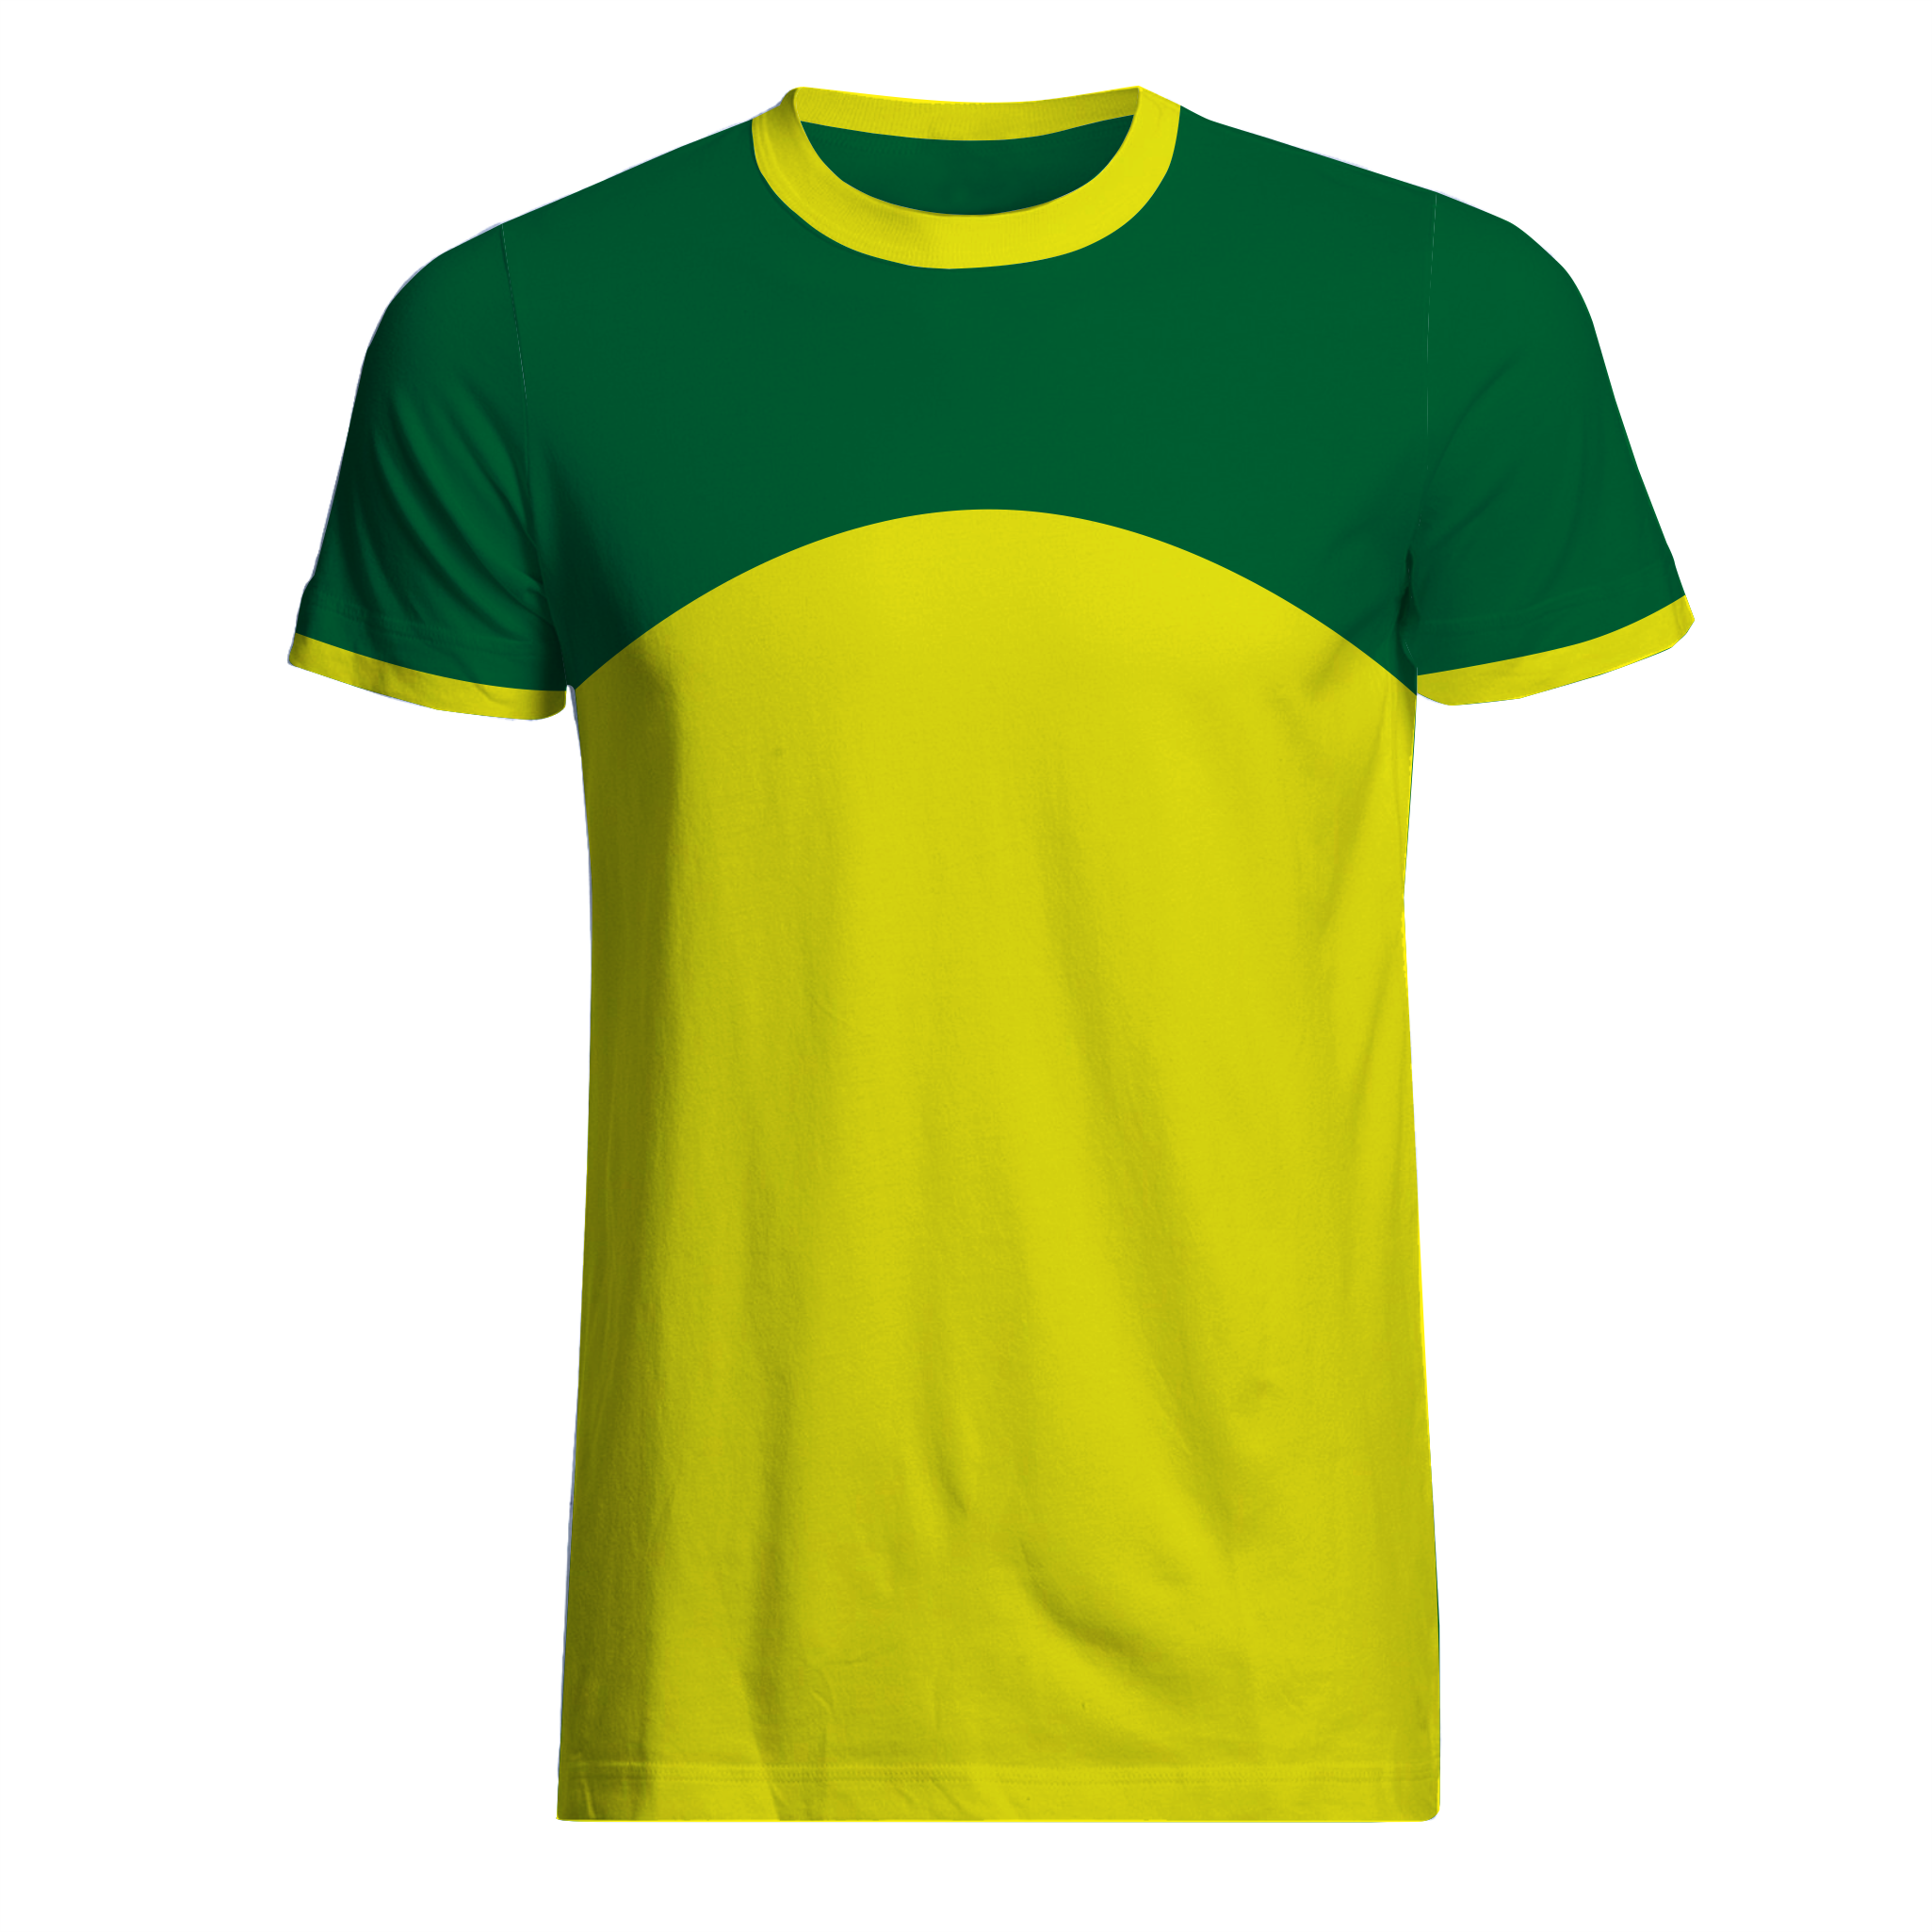 Panelled - Zuco football shirt - Reyaad